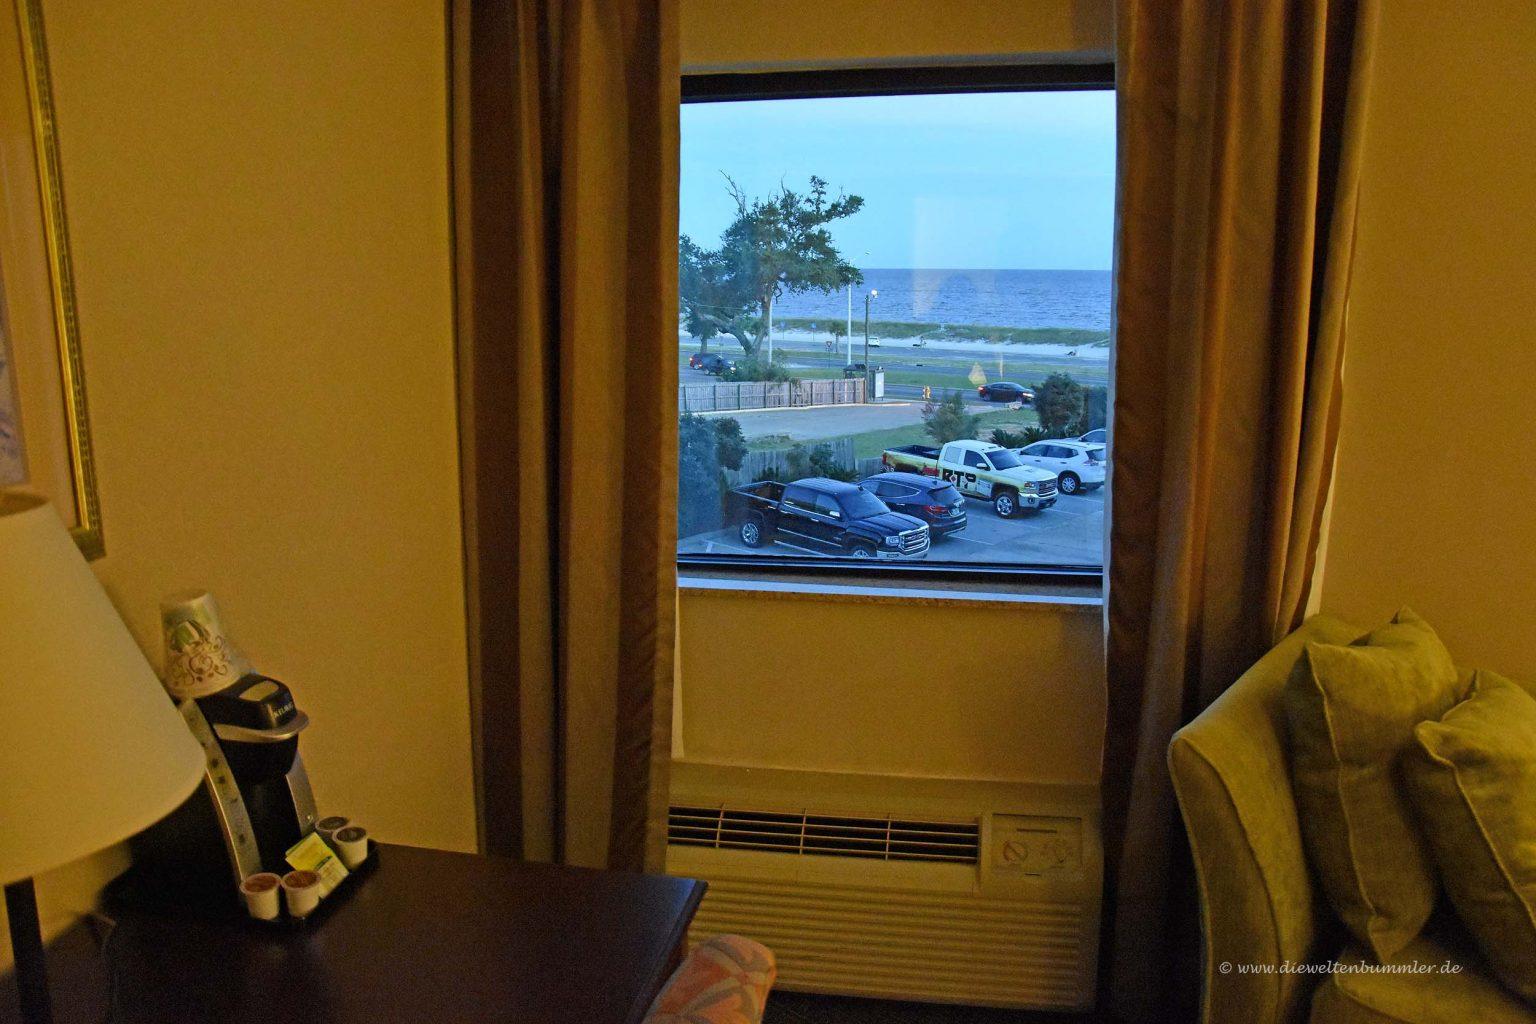 Holiday Inn in Biloxi